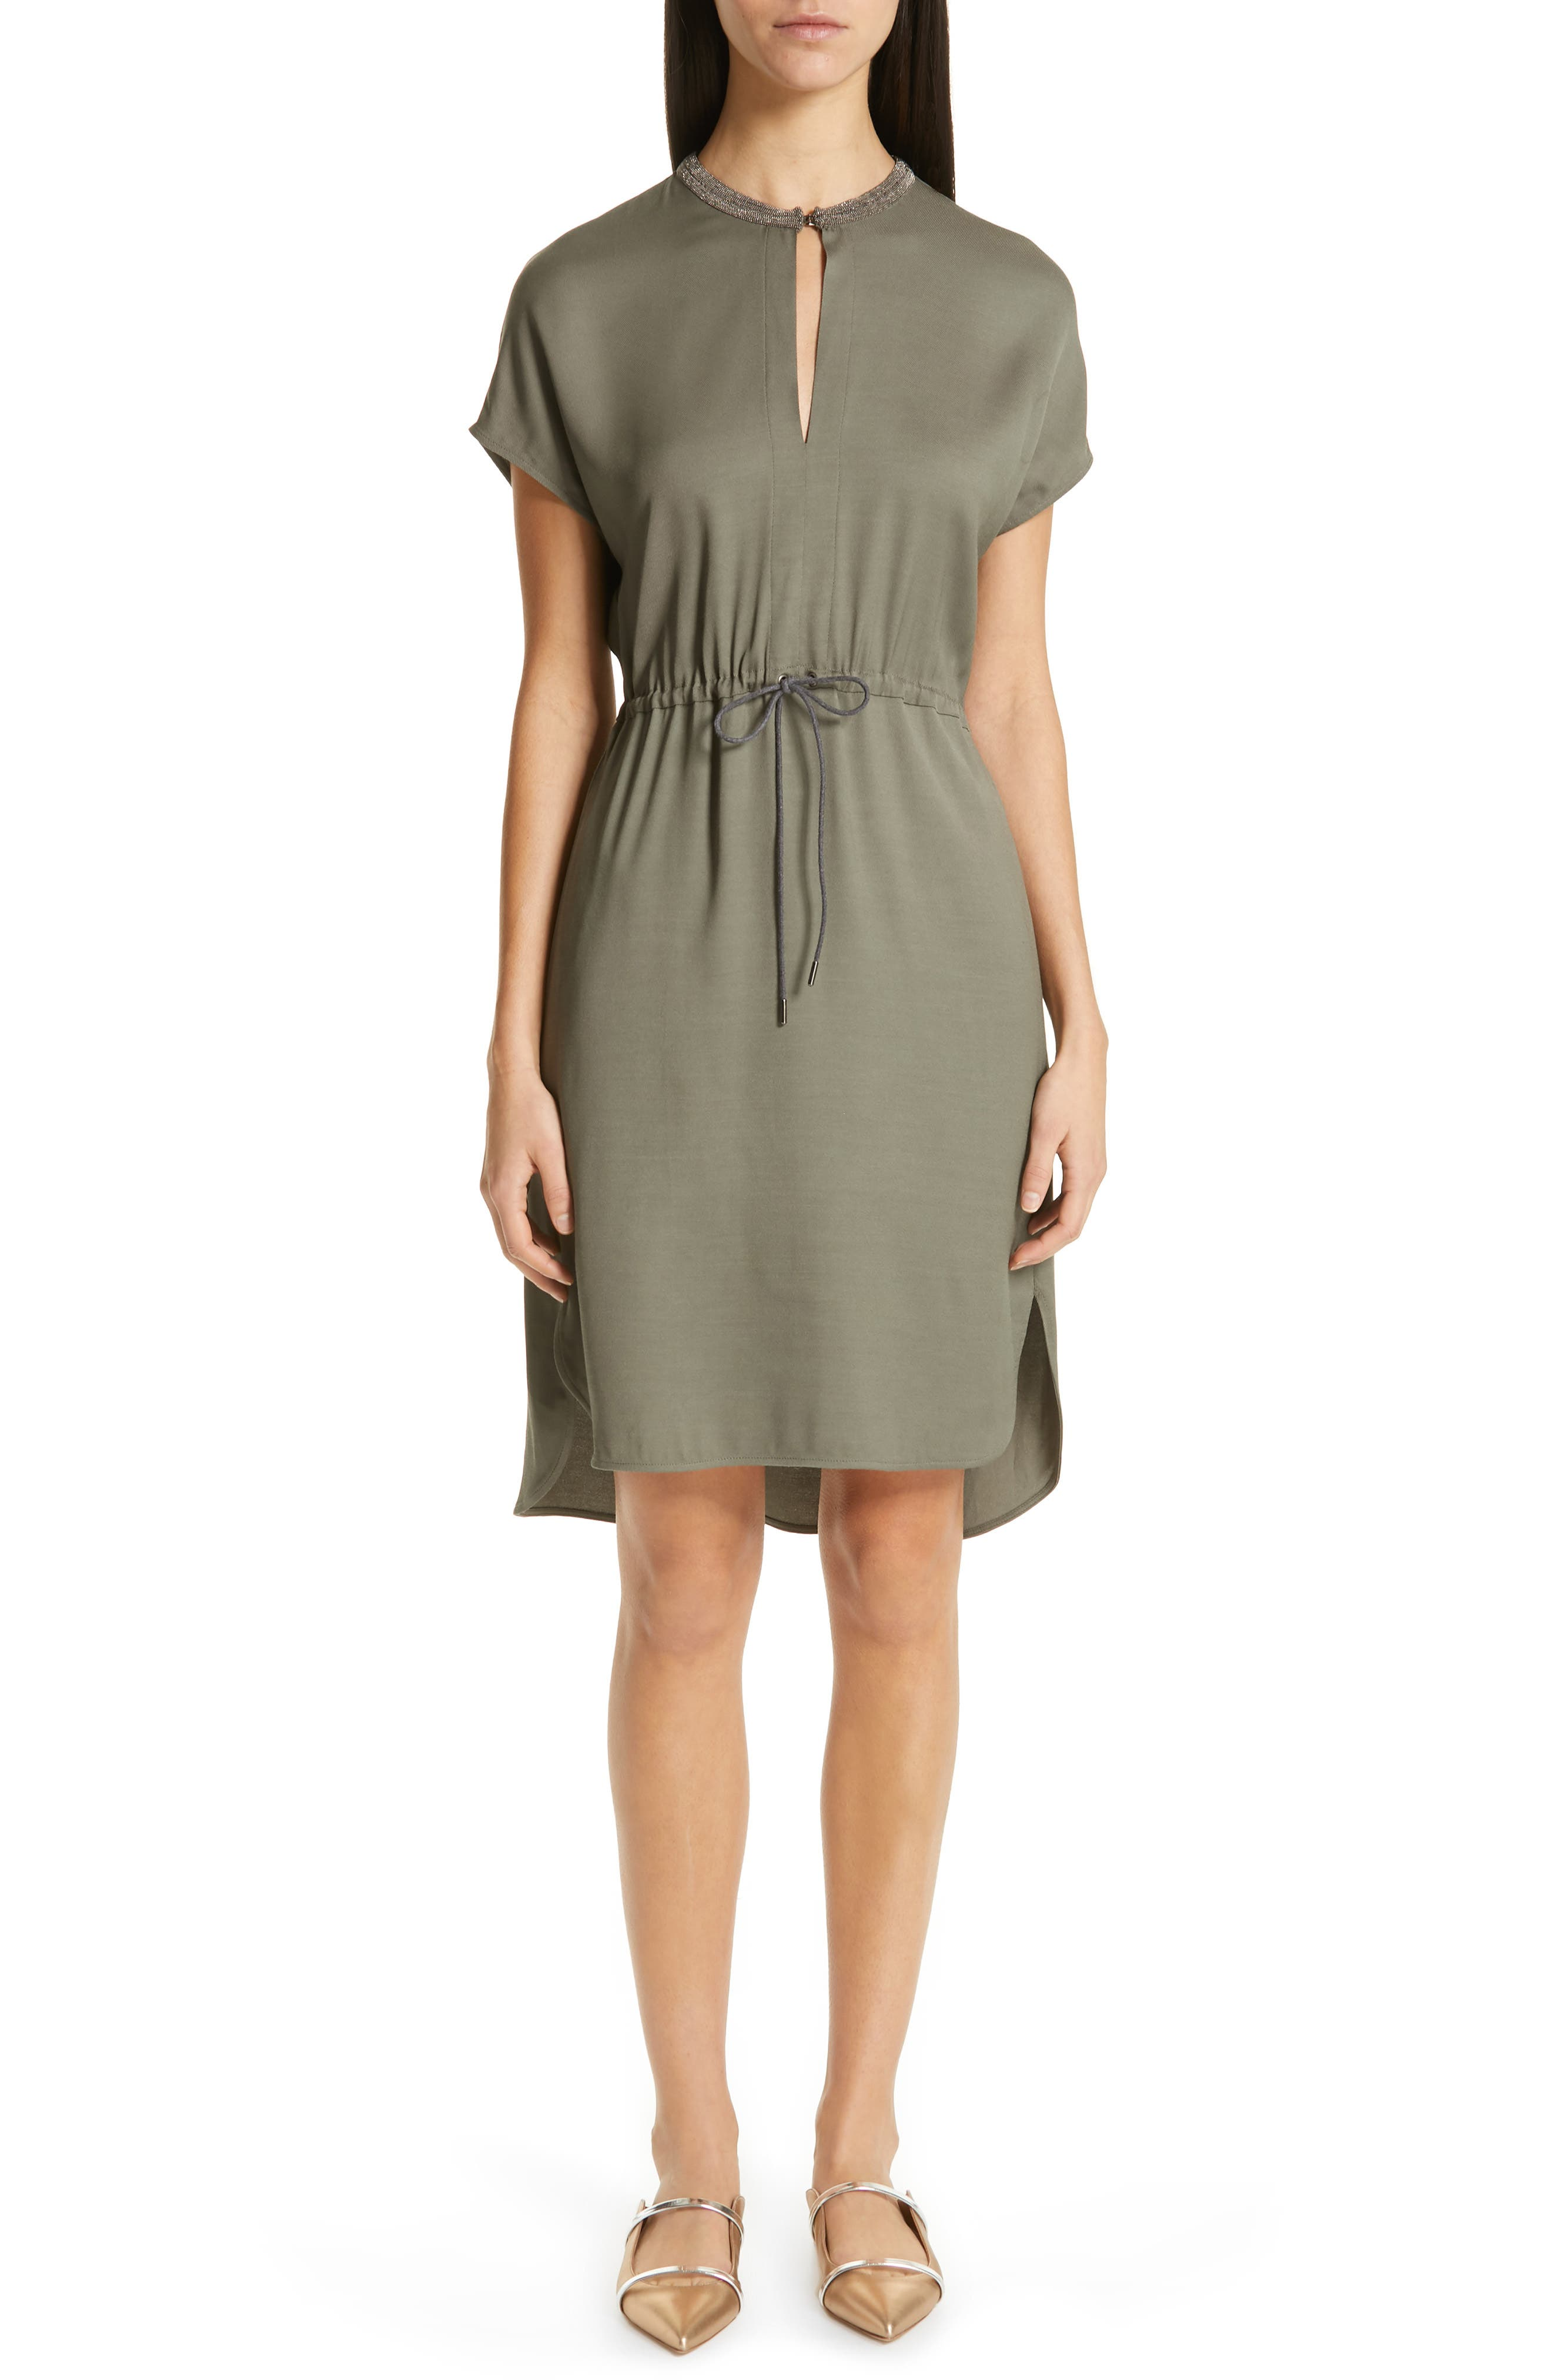 Fabiana Filippi Short Sleeve Dress, US / 48 IT - Green